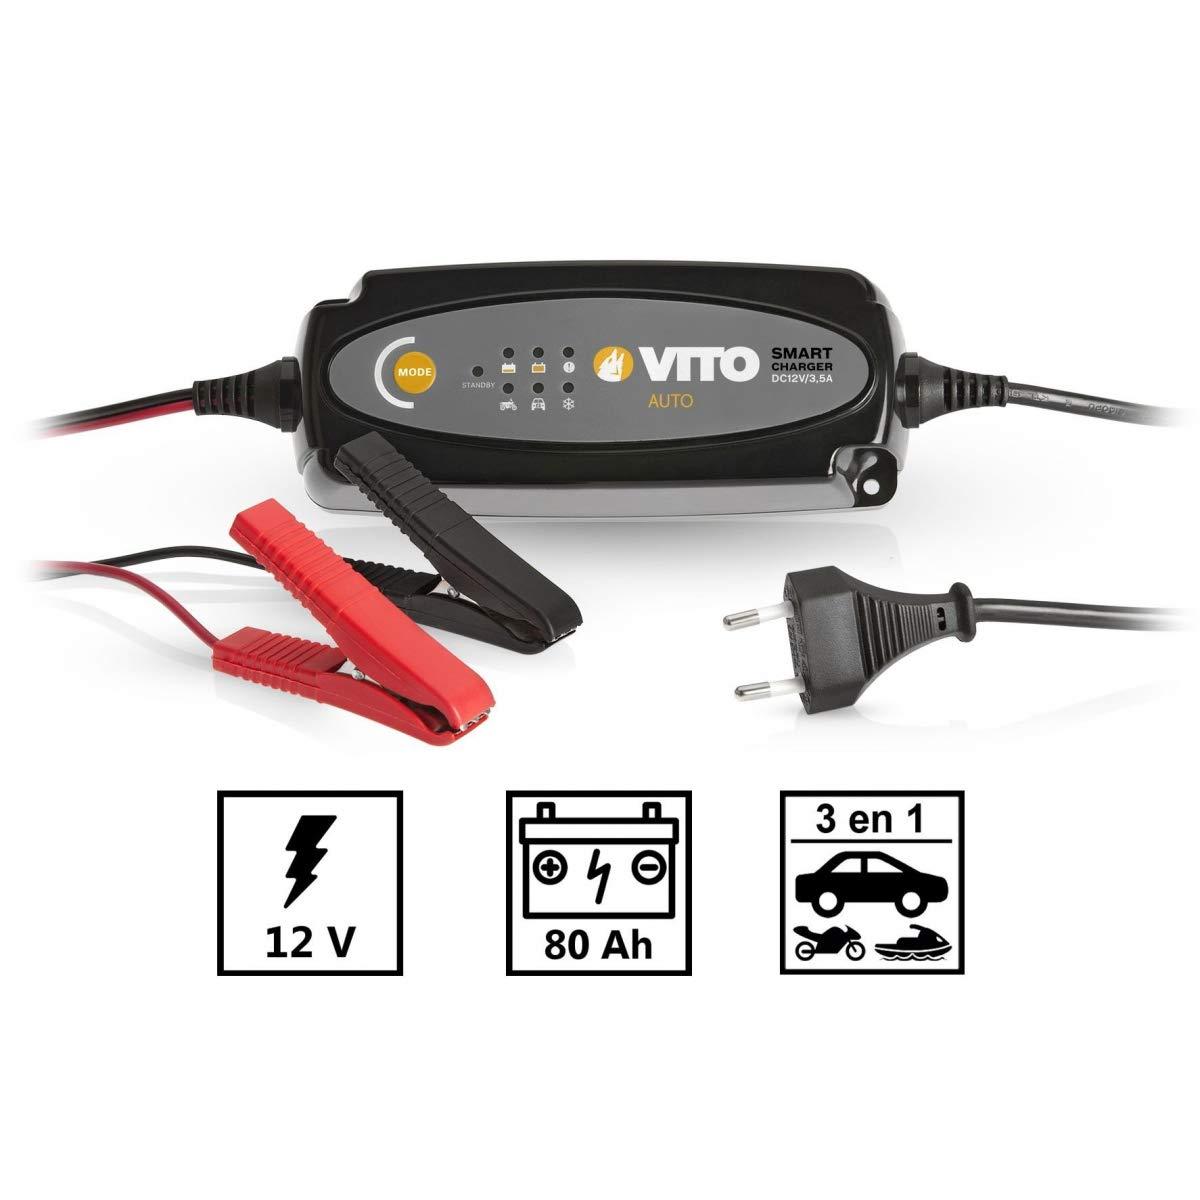 94ae6fb983484 Chargeur de batterie intelligent voiture, moto, jet ski VITO - 12V ...